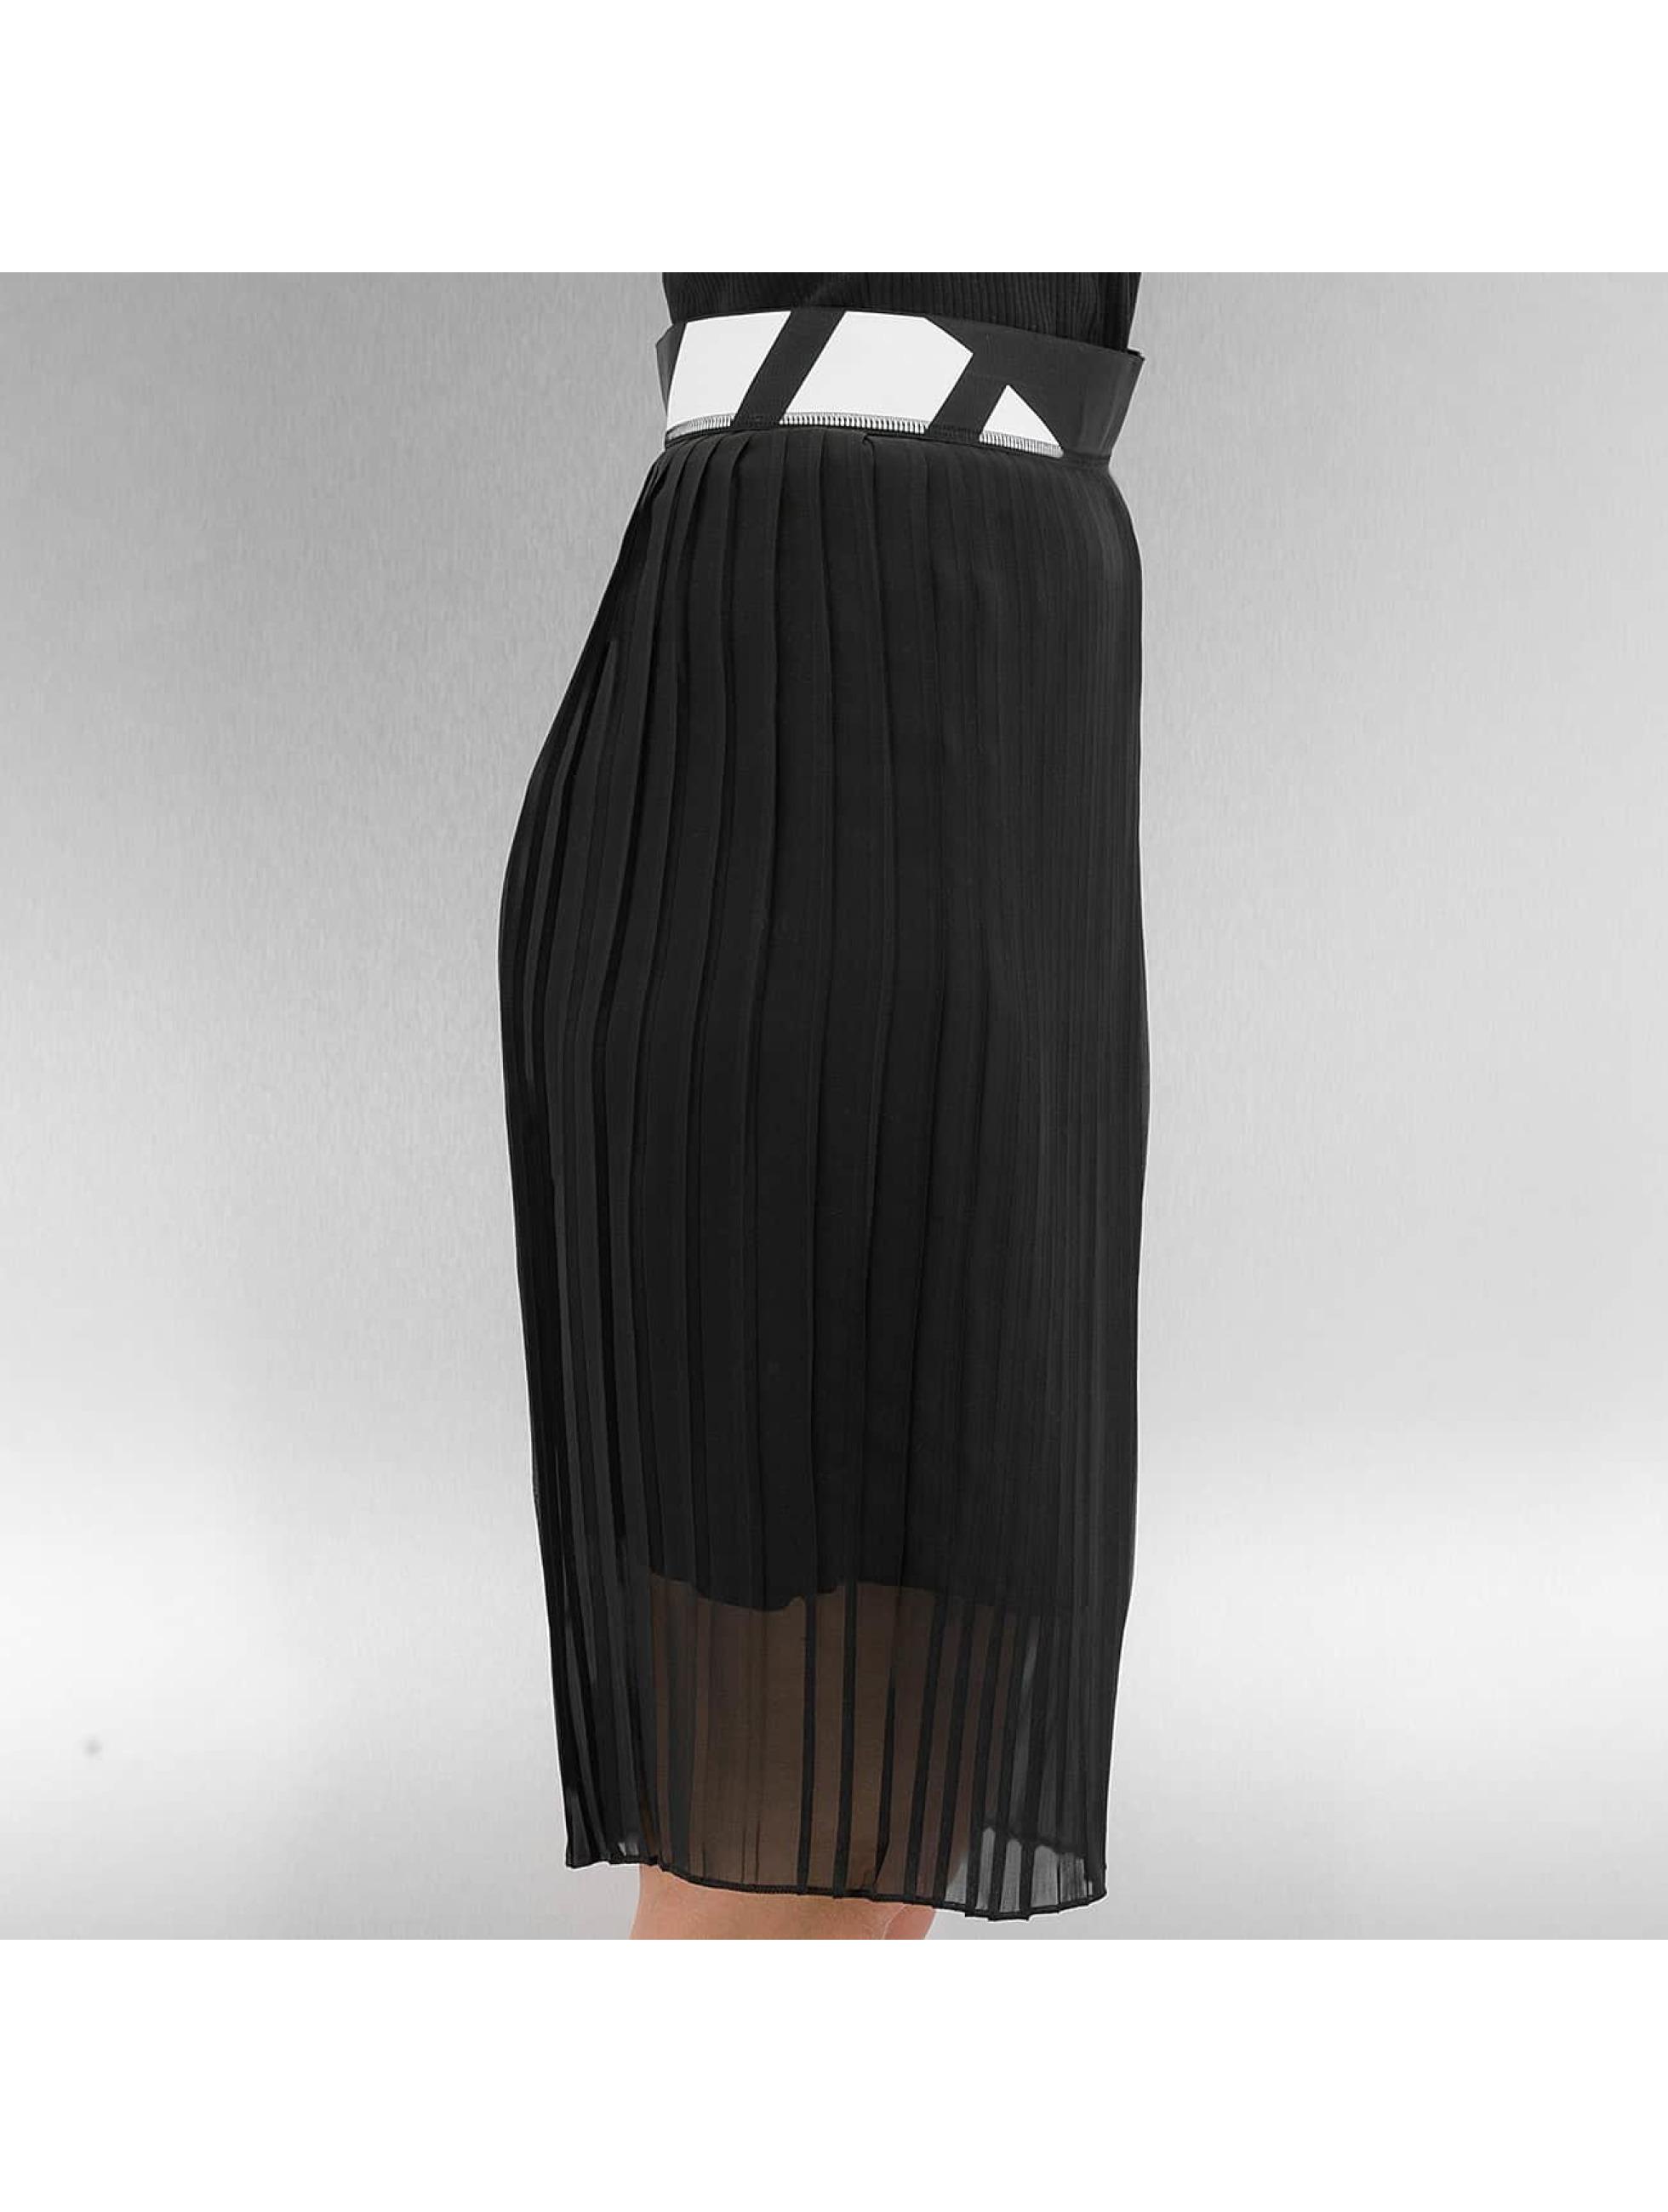 adidas originals Skirt Pleated black